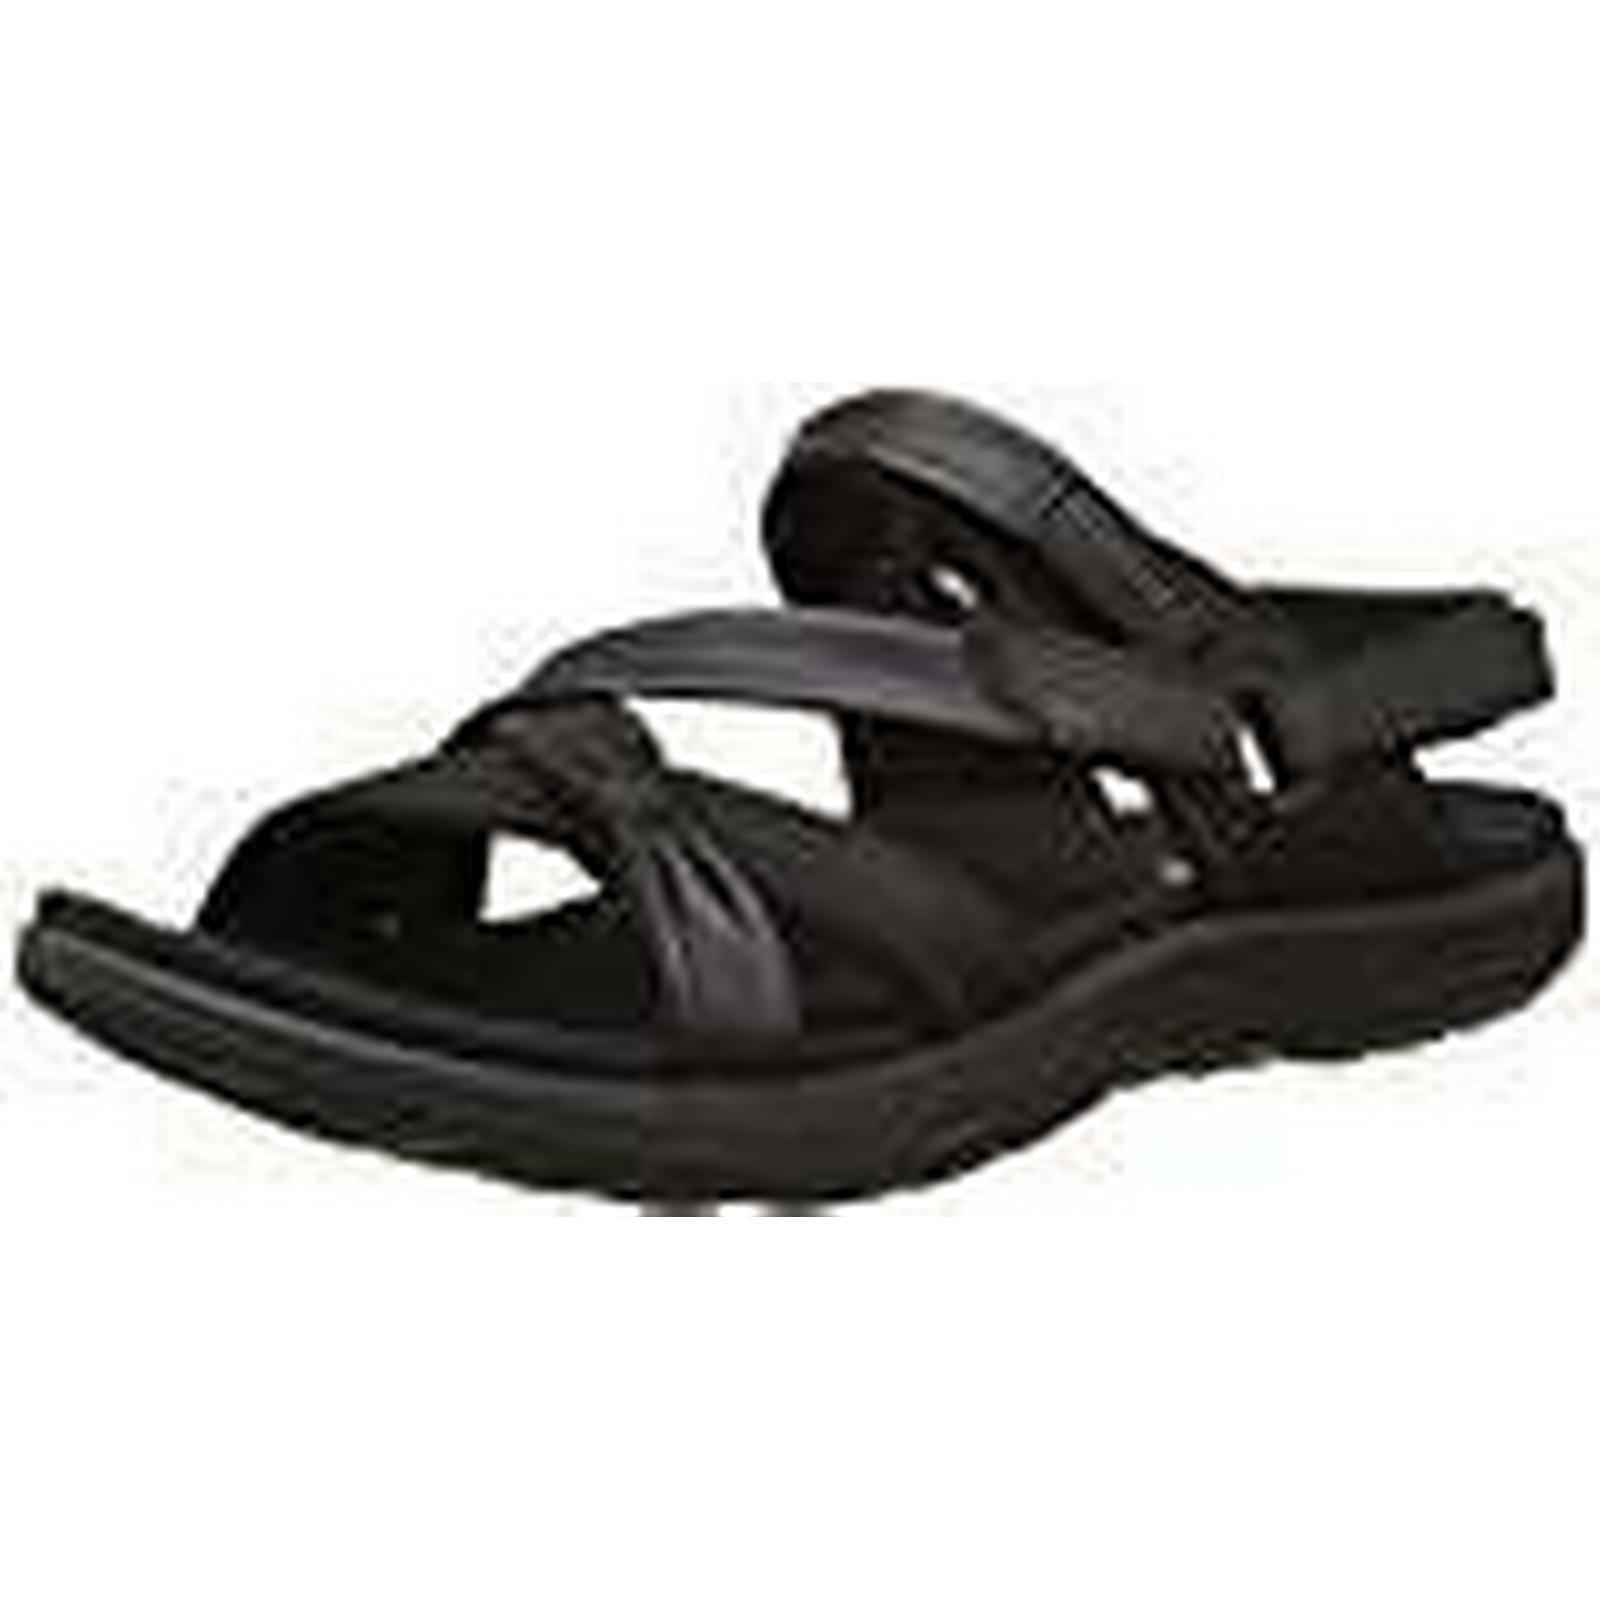 Merrell Women Black Vesper Lattice Flat Sandals, Black Women (Black), 4 UK 37 EU a08bb5